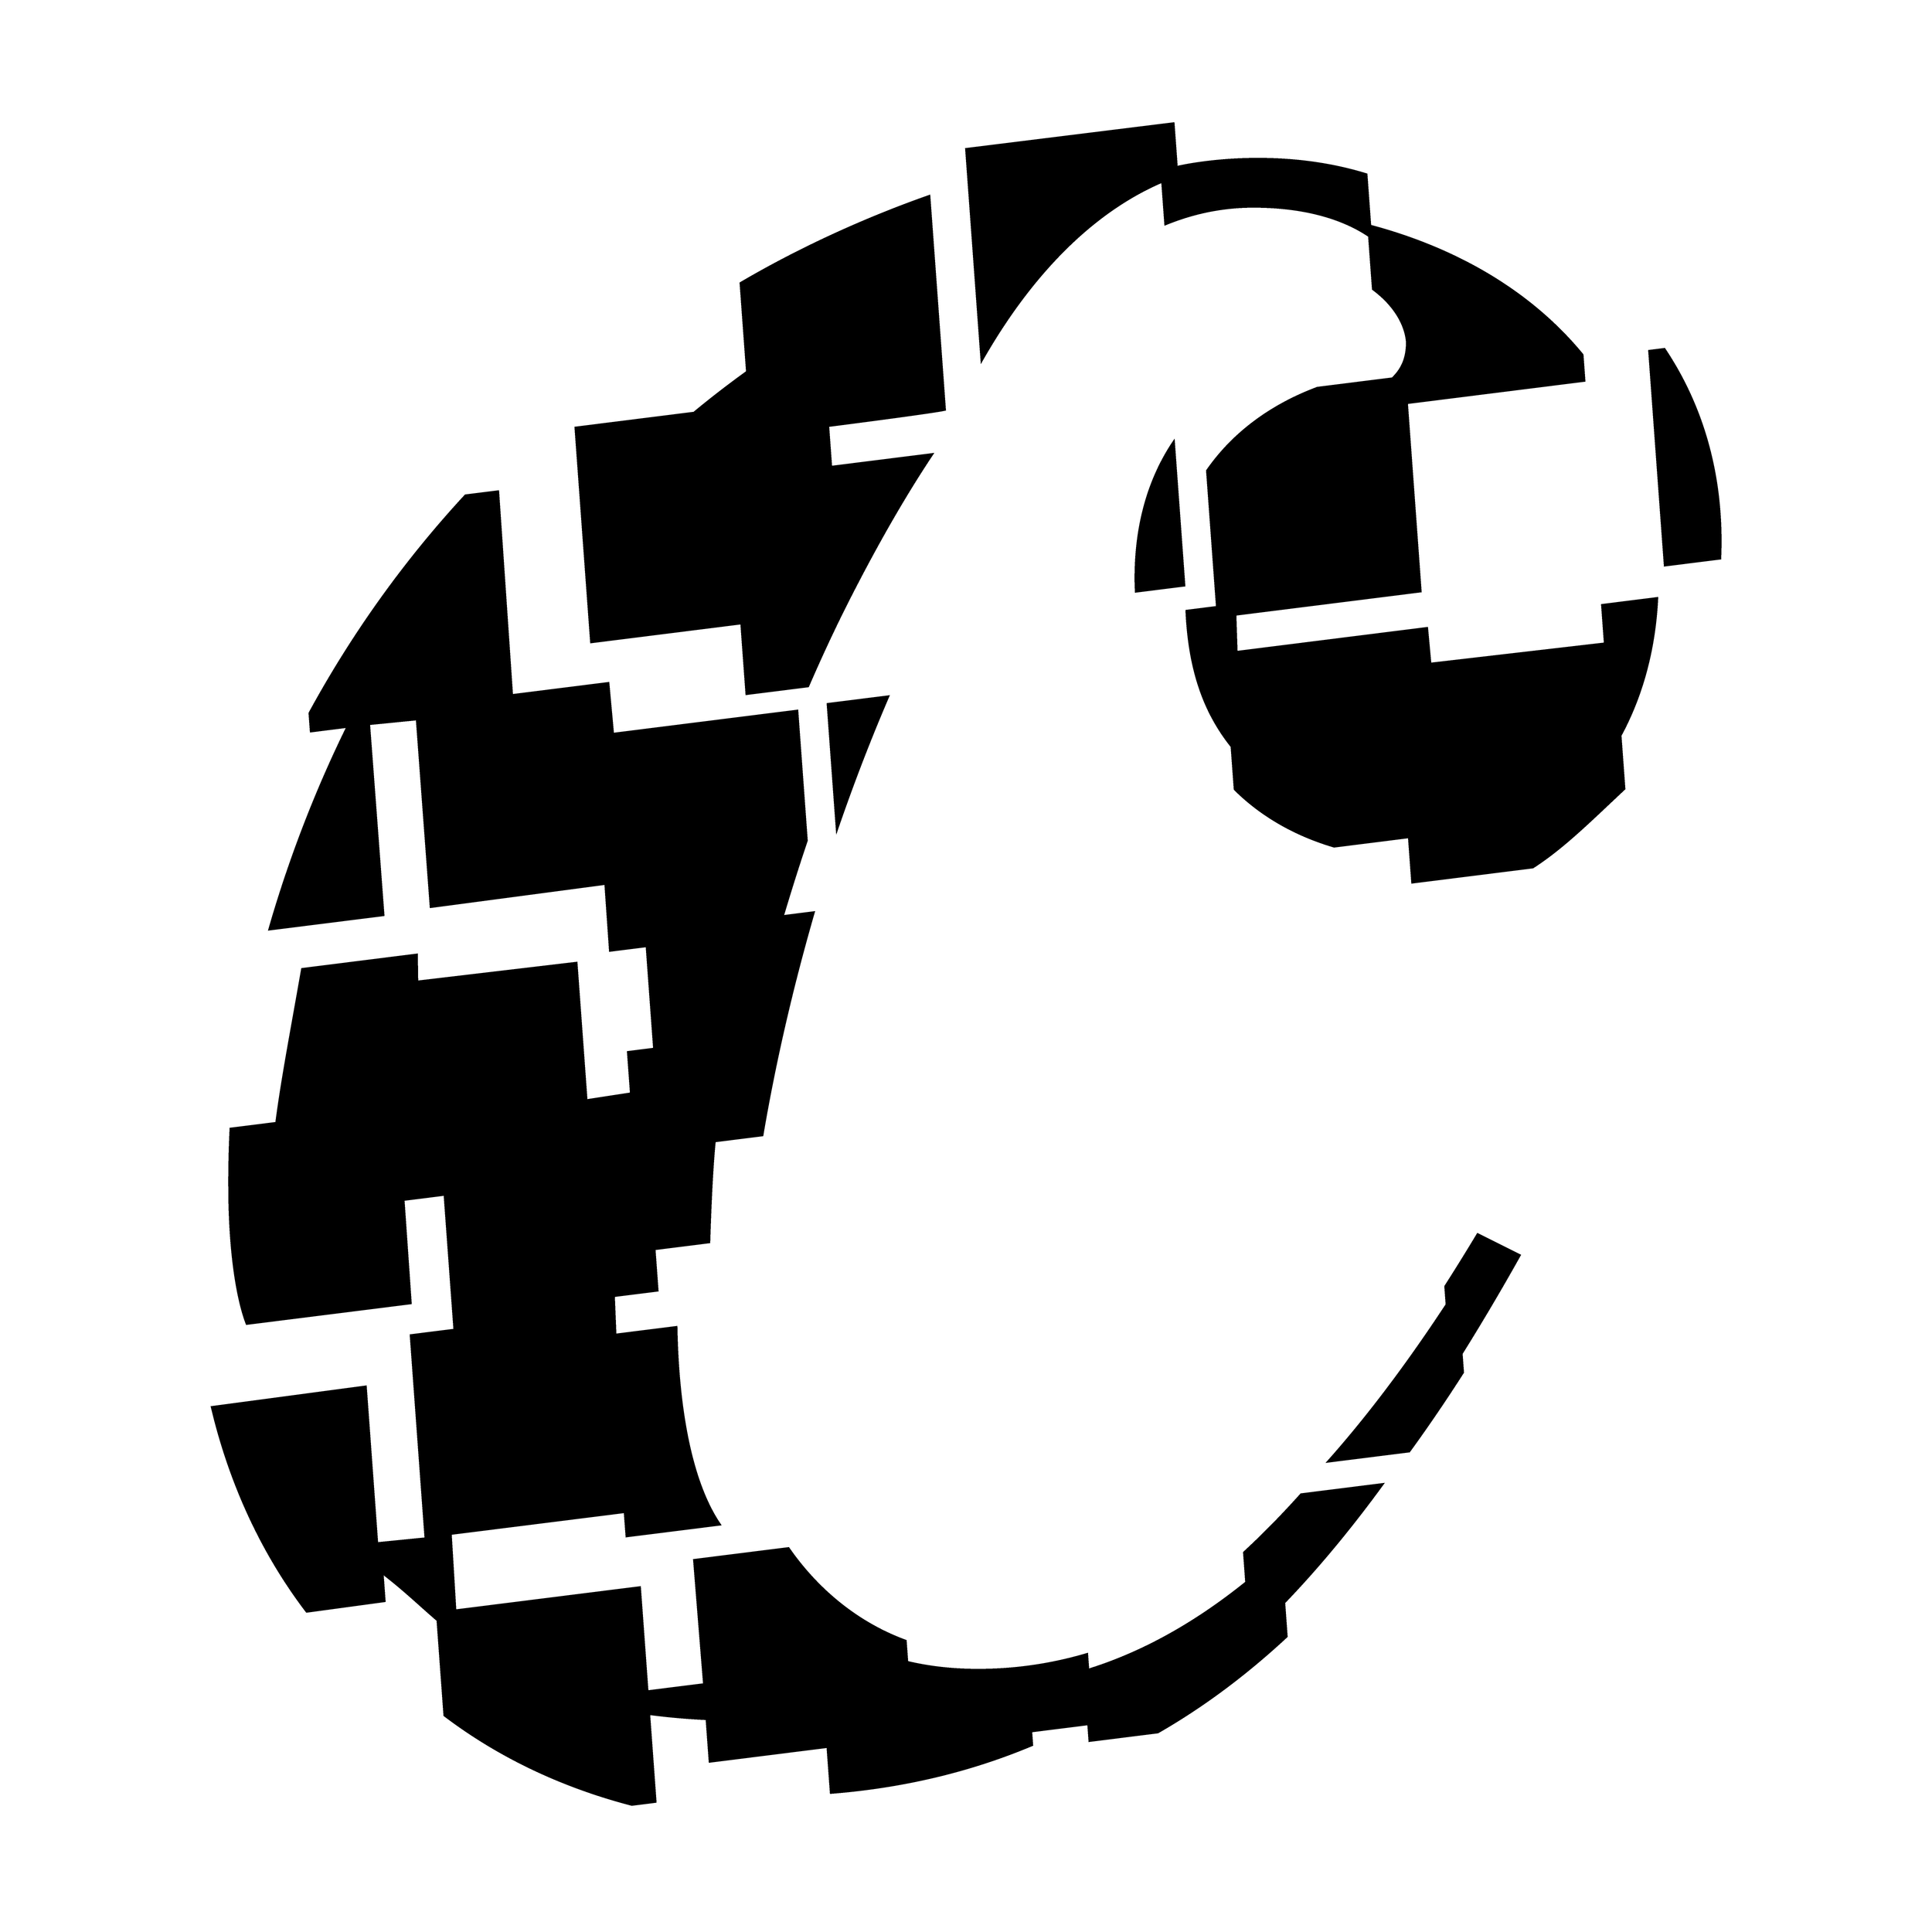 cov_logo_icon_socialmedia.png